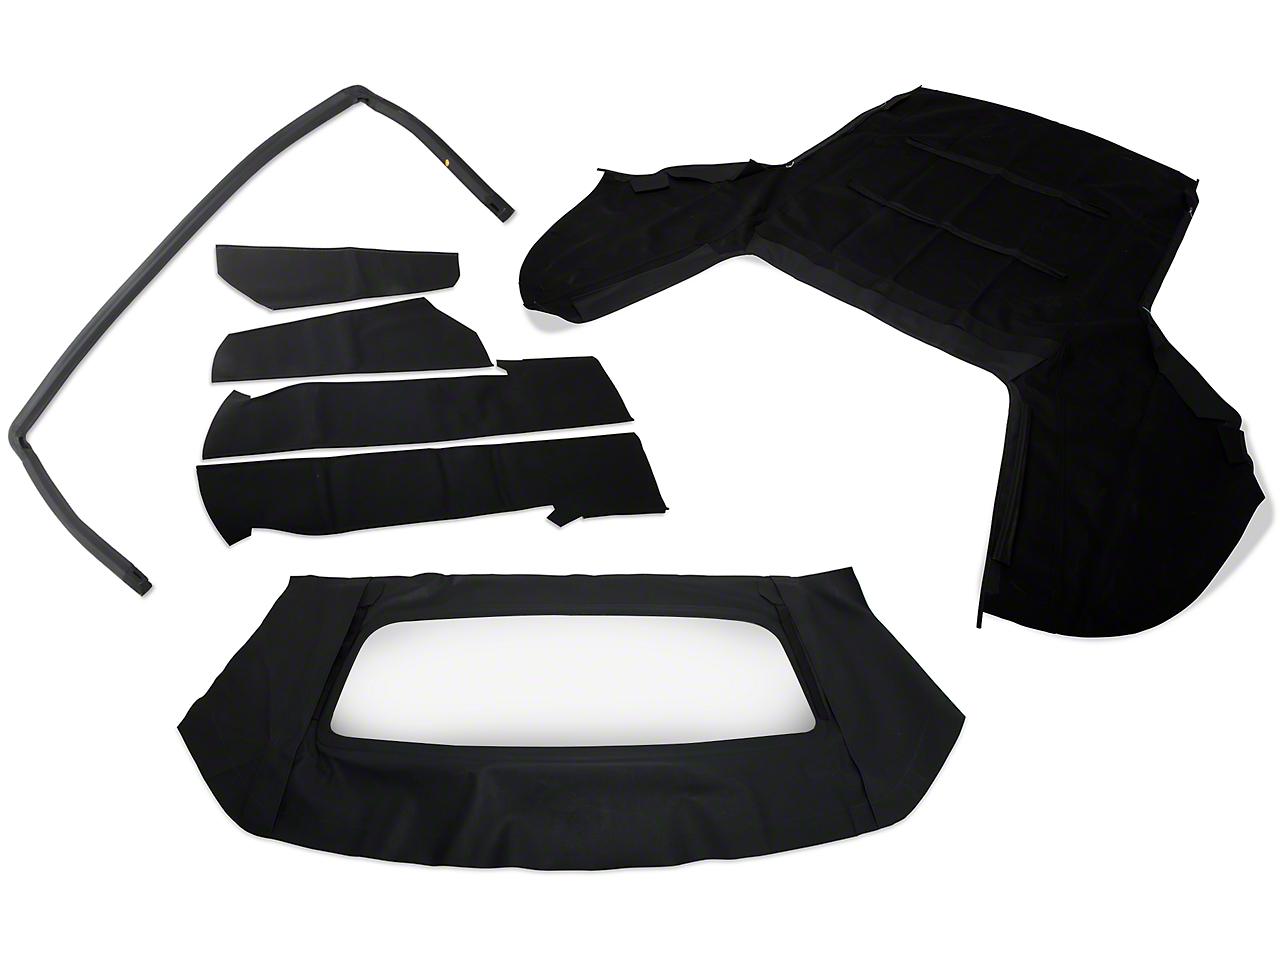 OPR Convertible Top Resto Kit - Black (91-93 All)